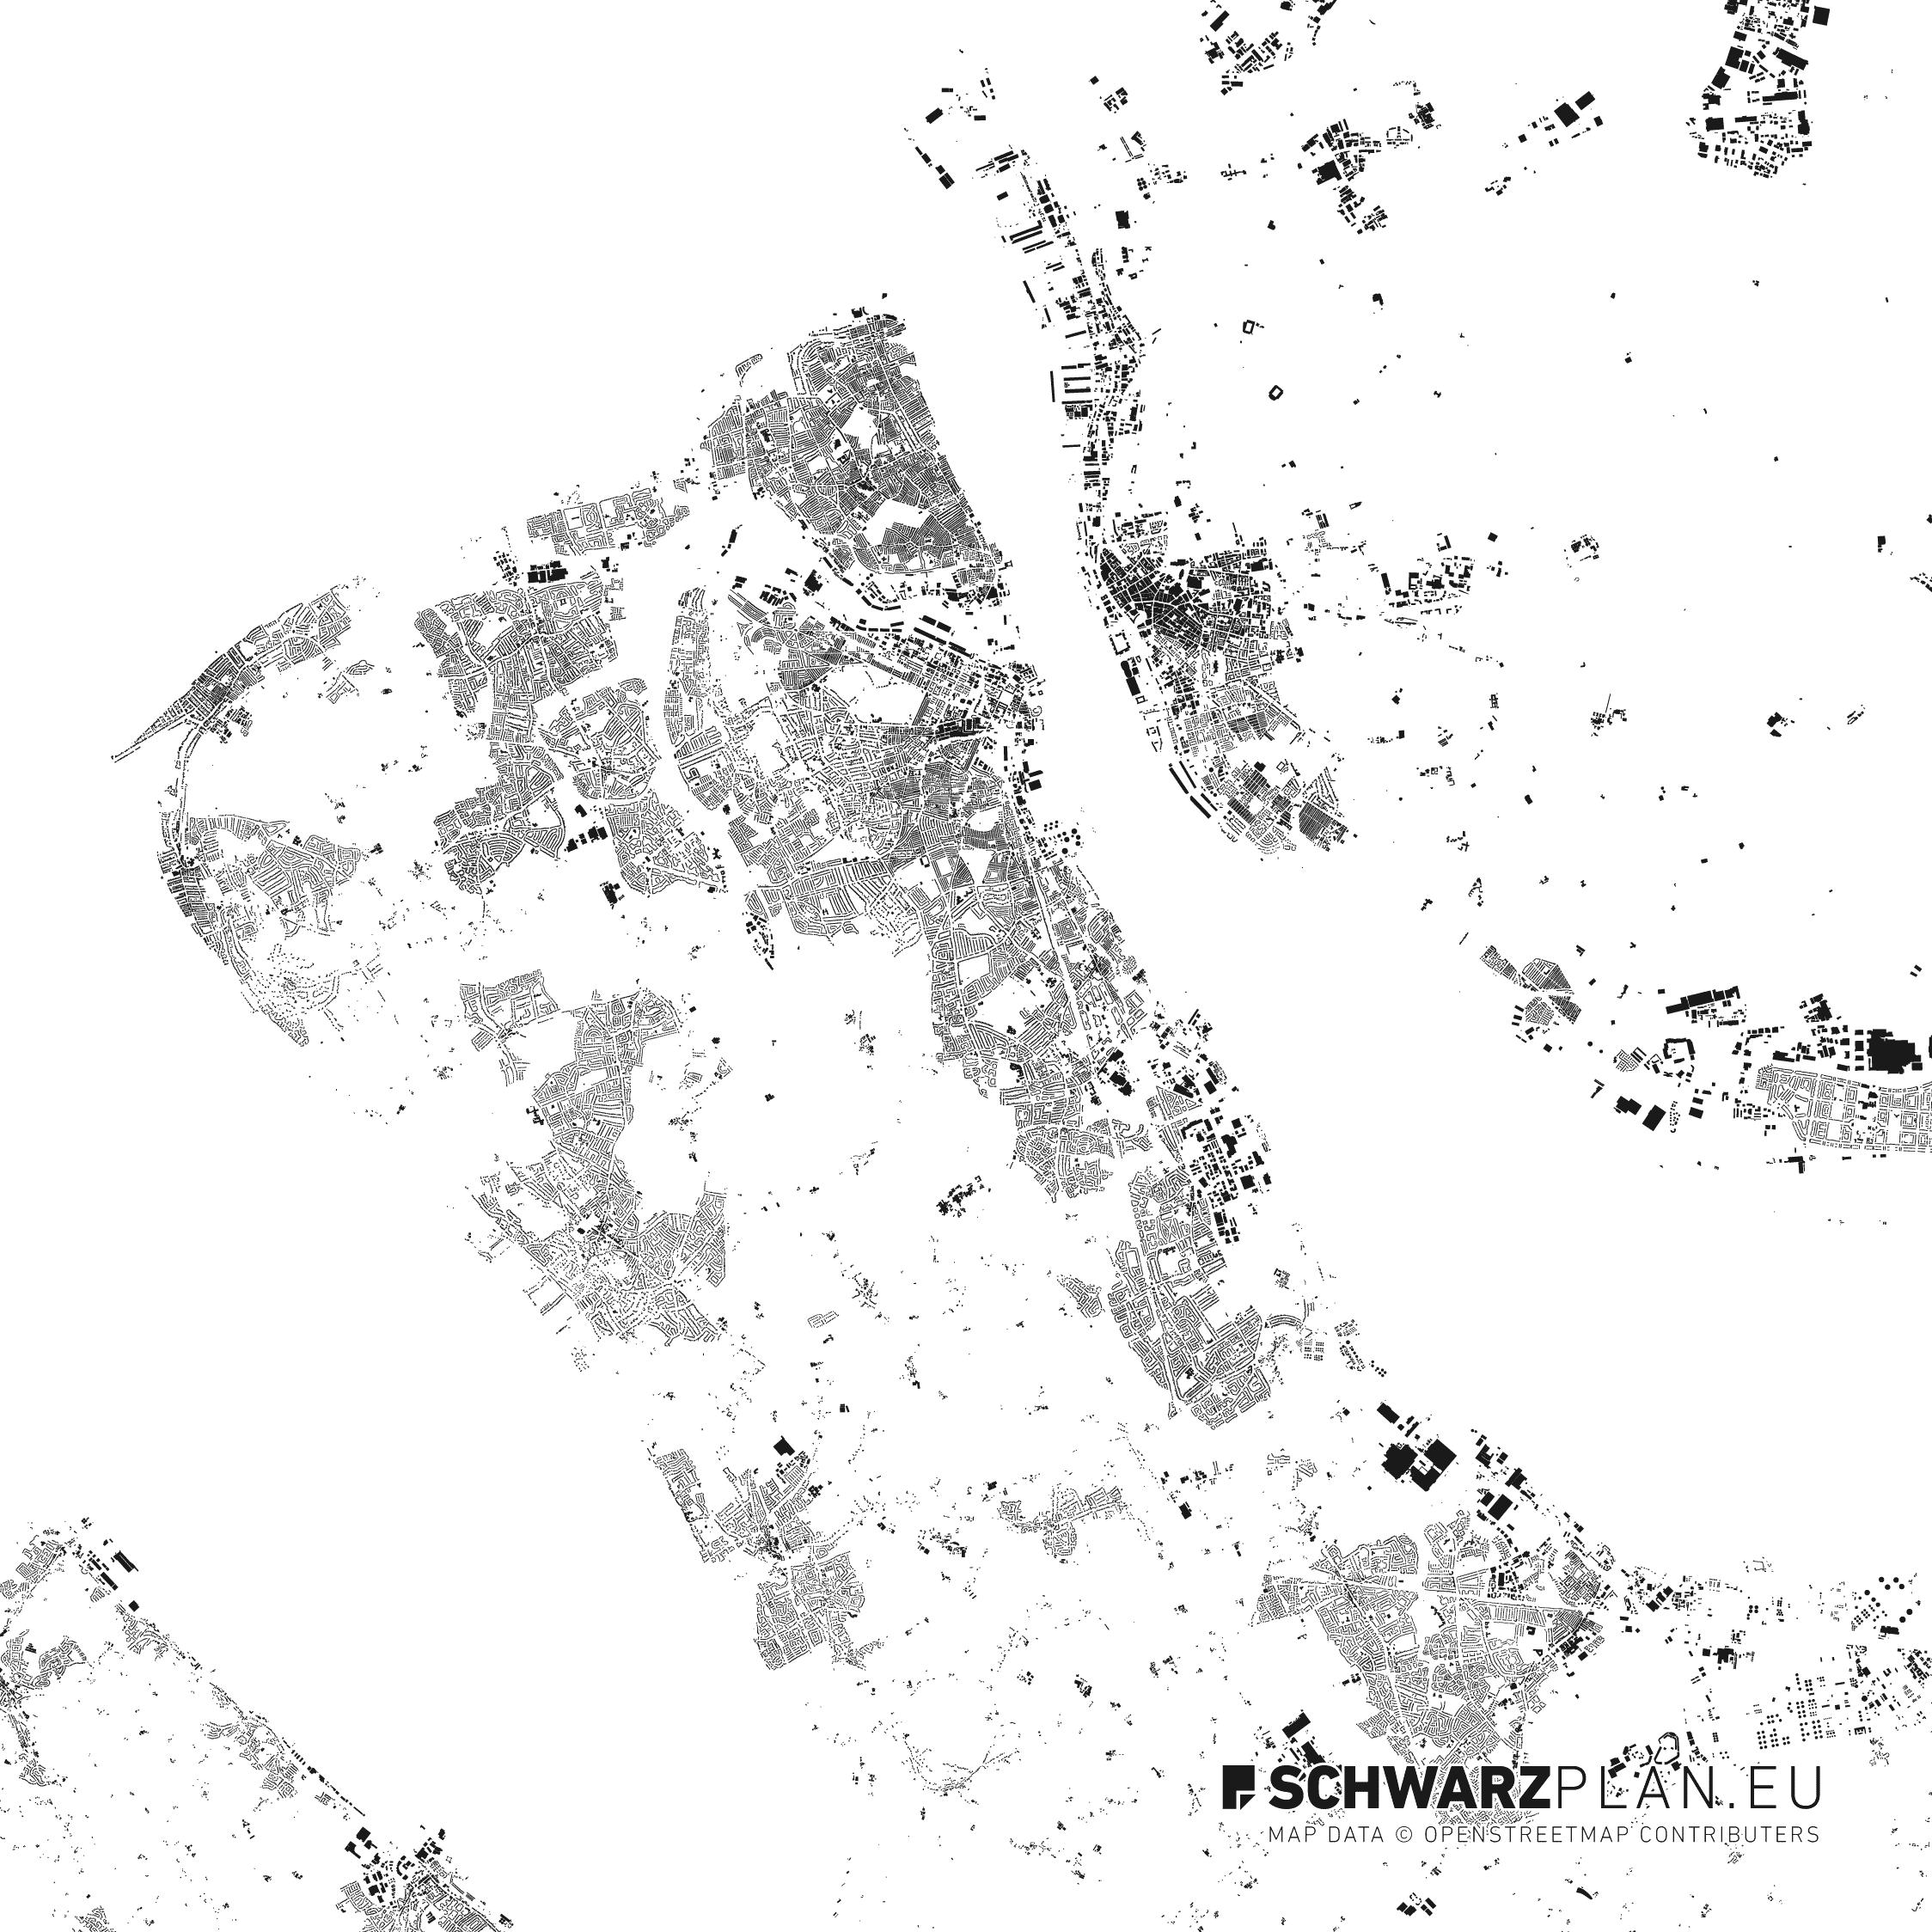 Figure ground plan of Liverpool